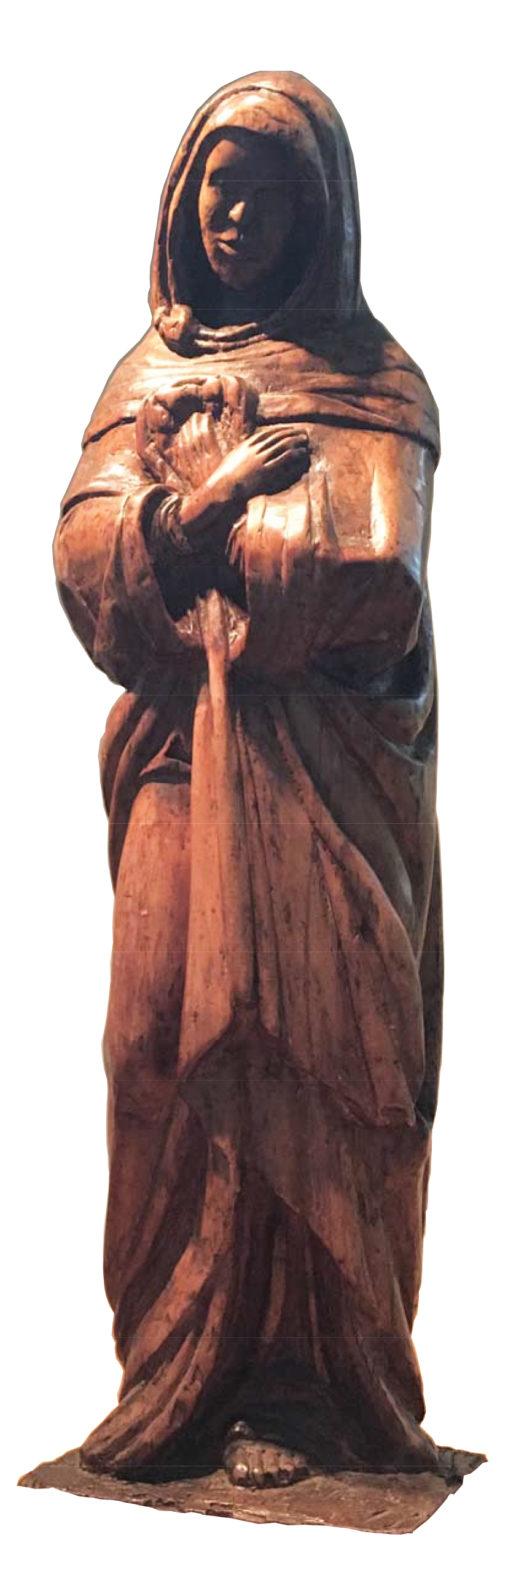 "Ernest Mancoba, ""Black Madonna"", 1929, yellow wood sculpture, 86 x 22 x 17 cm"